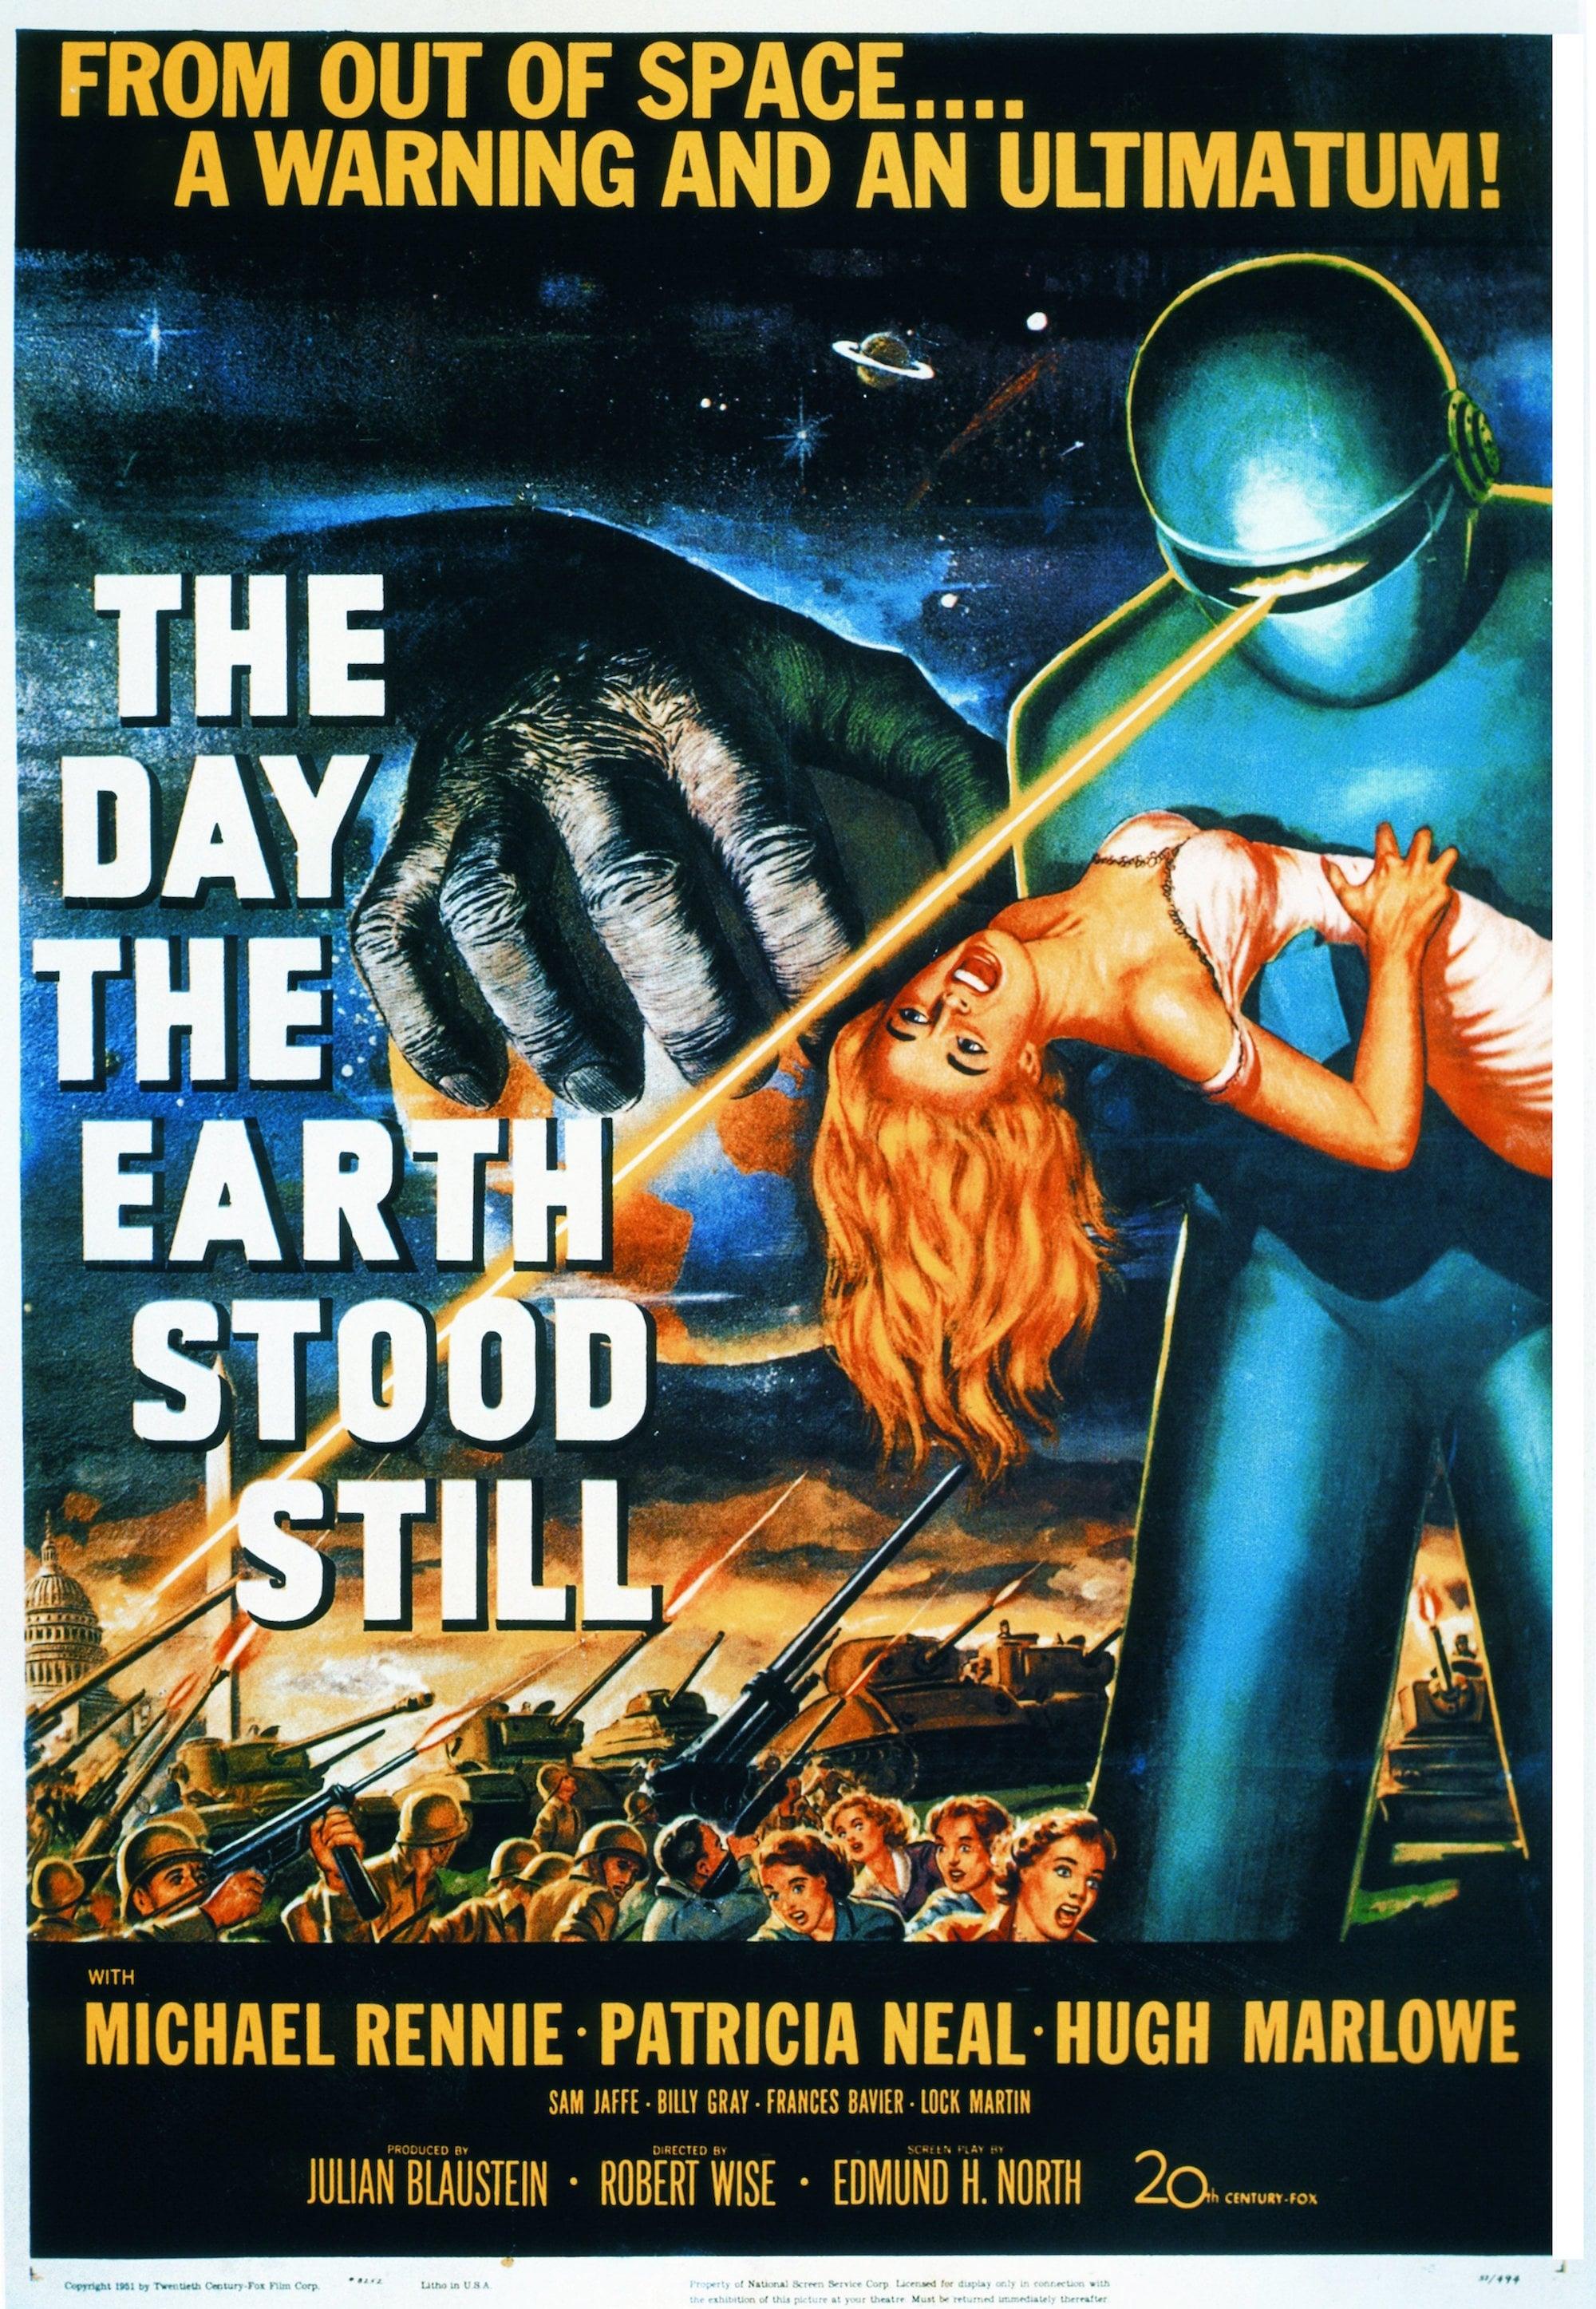 The Day the Earth Stood Still (1951) FULL MOVIE - YouTube